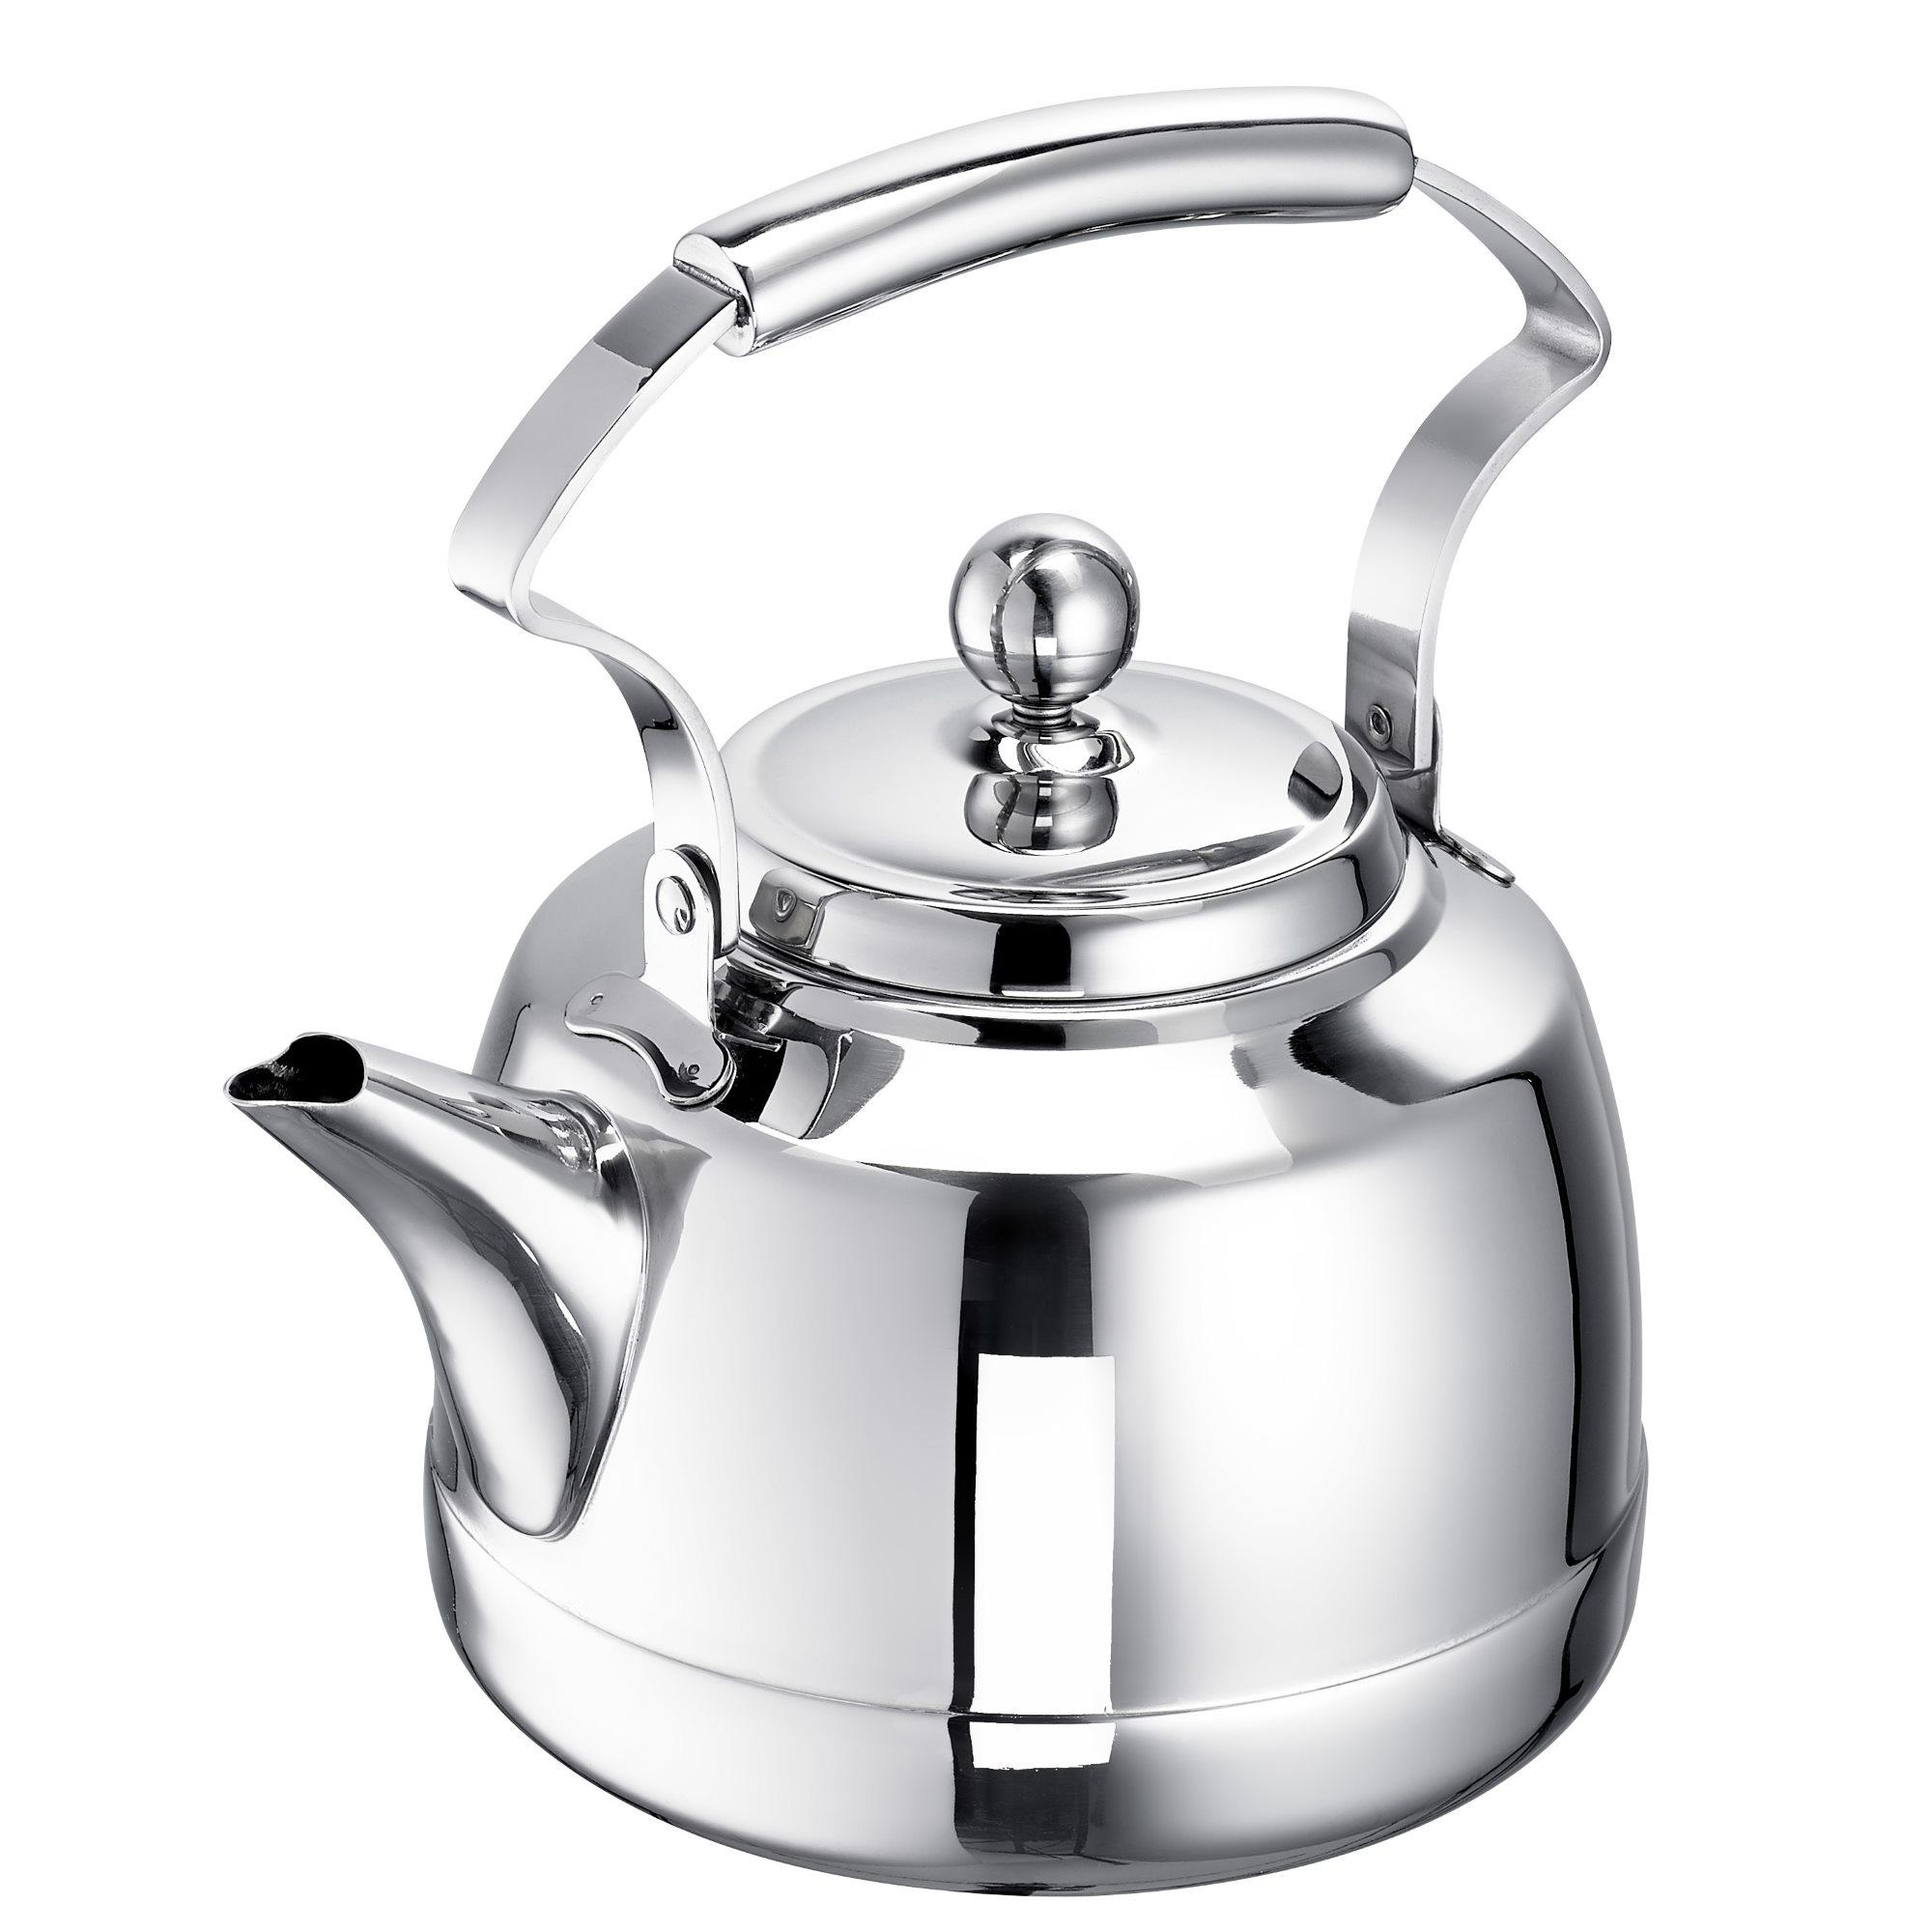 schulte ufer water kettle nick 2 0 litre